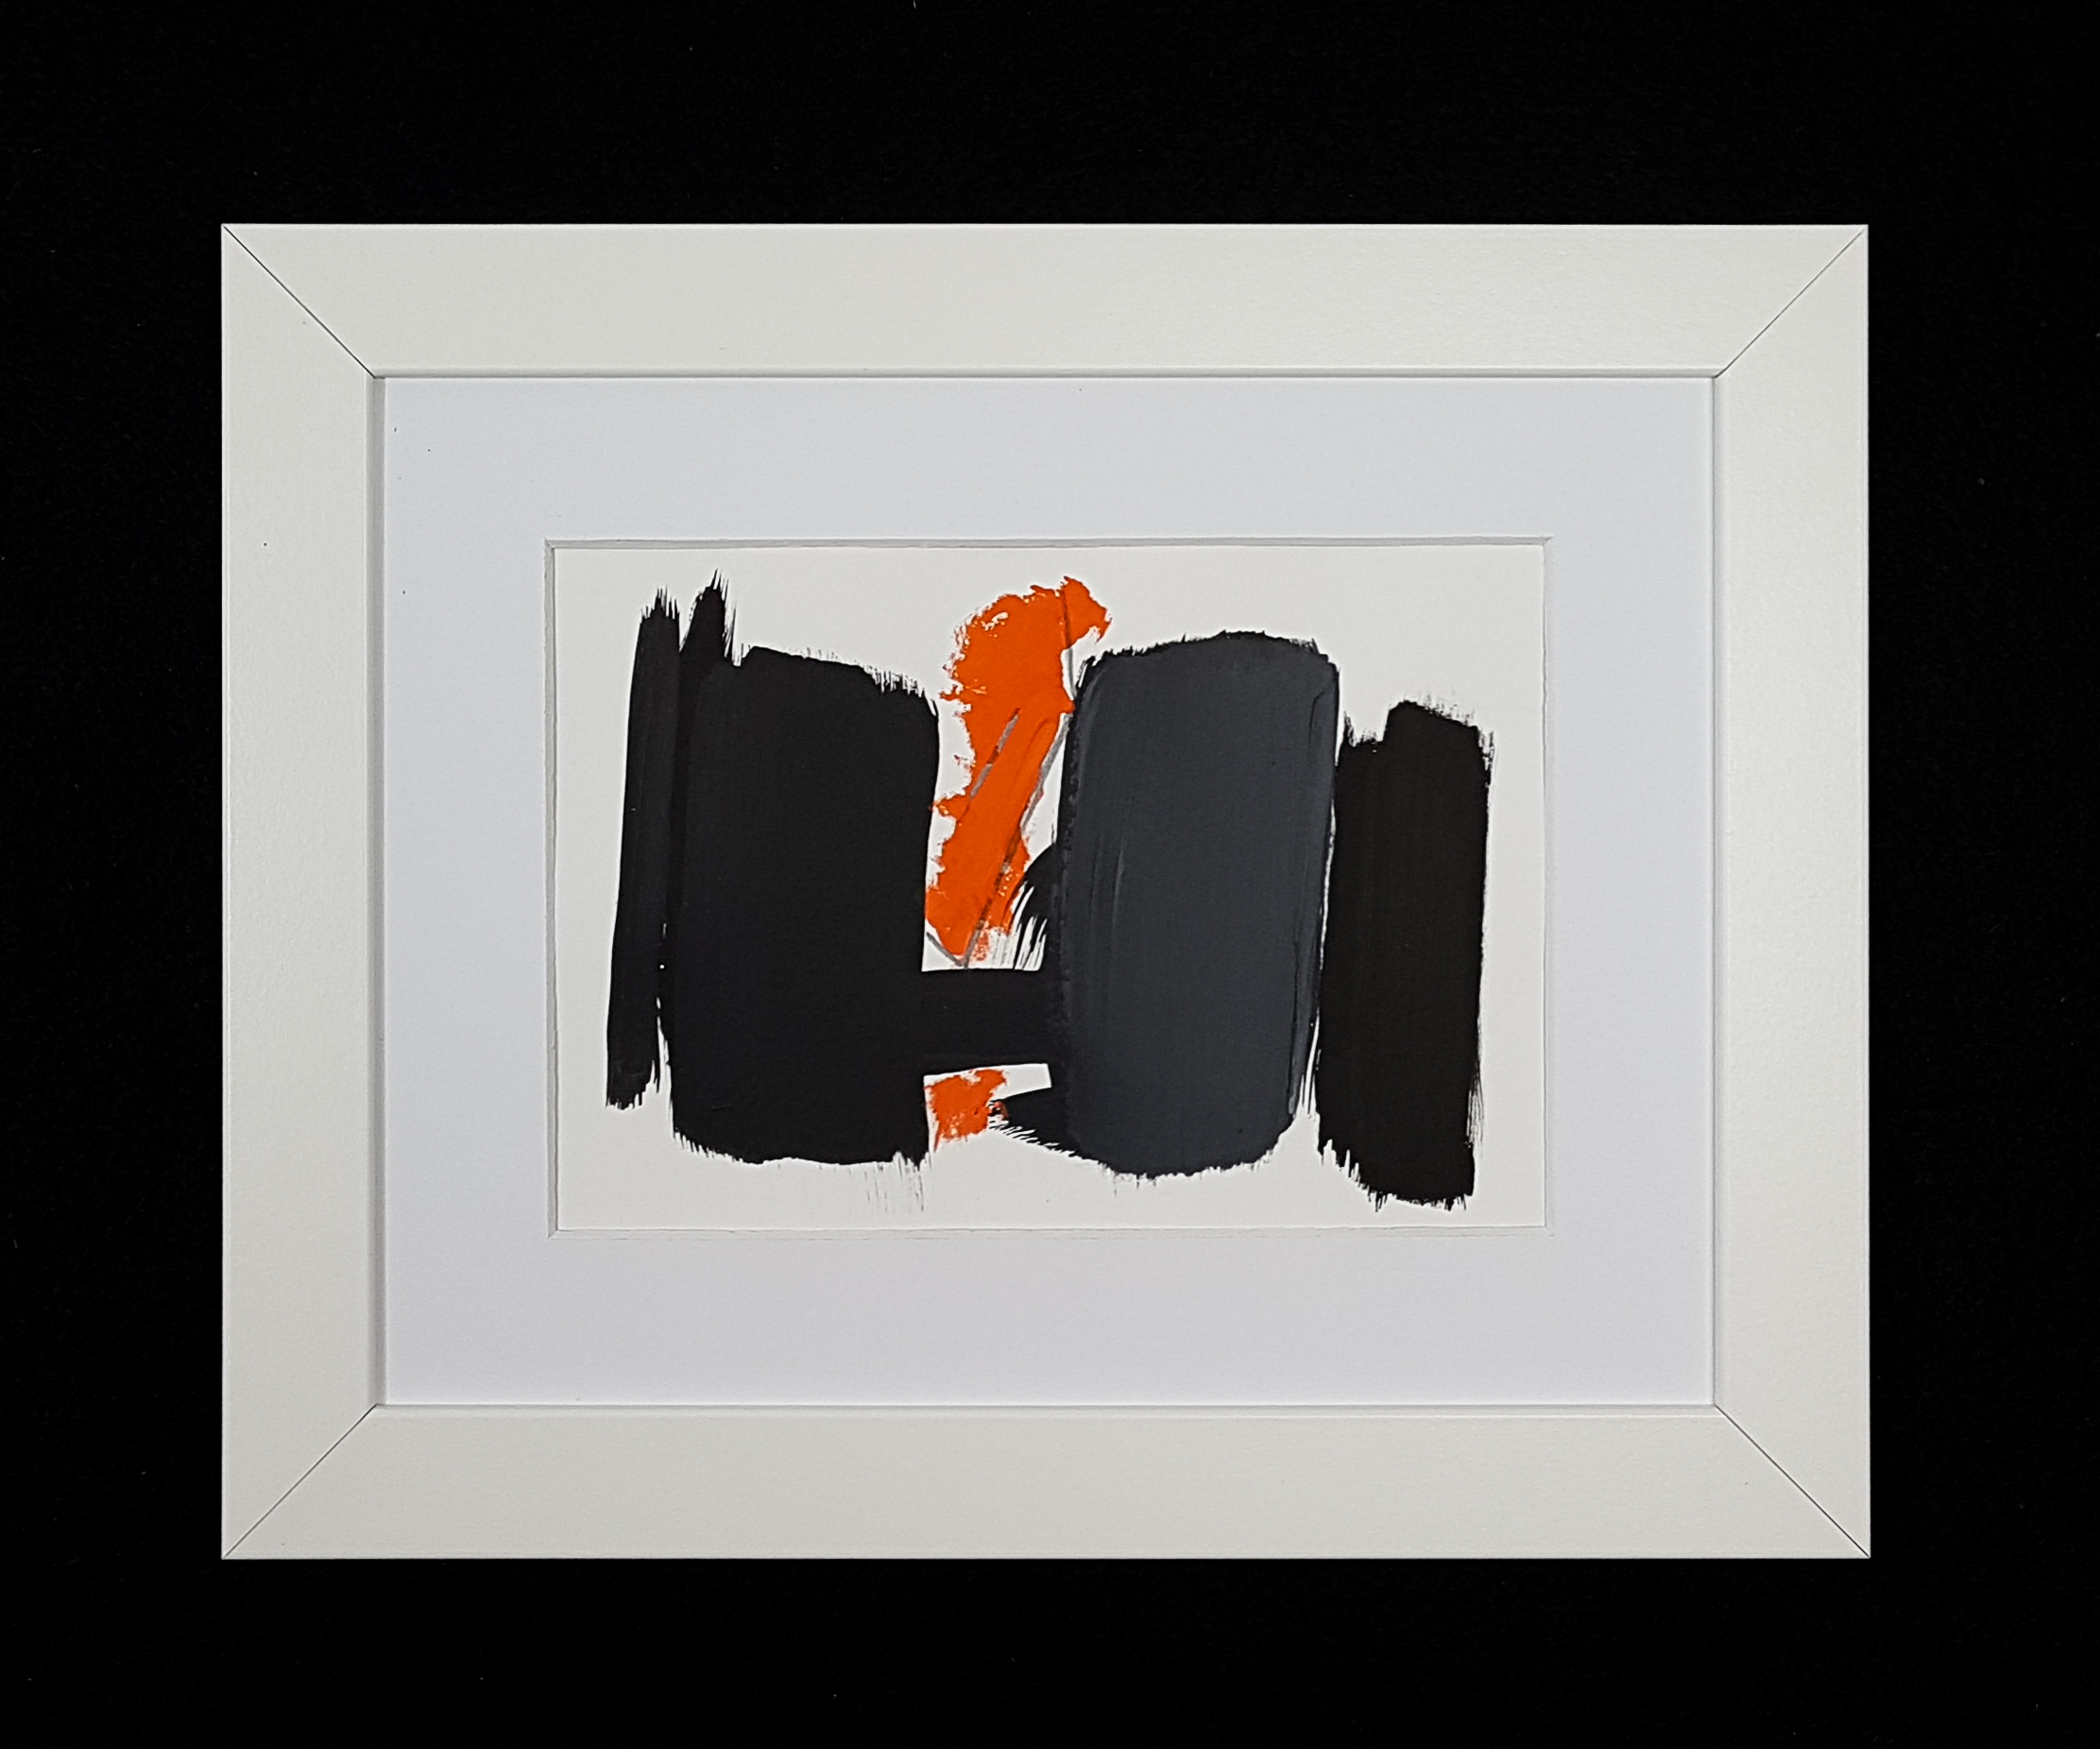 Gray, Orange, Black